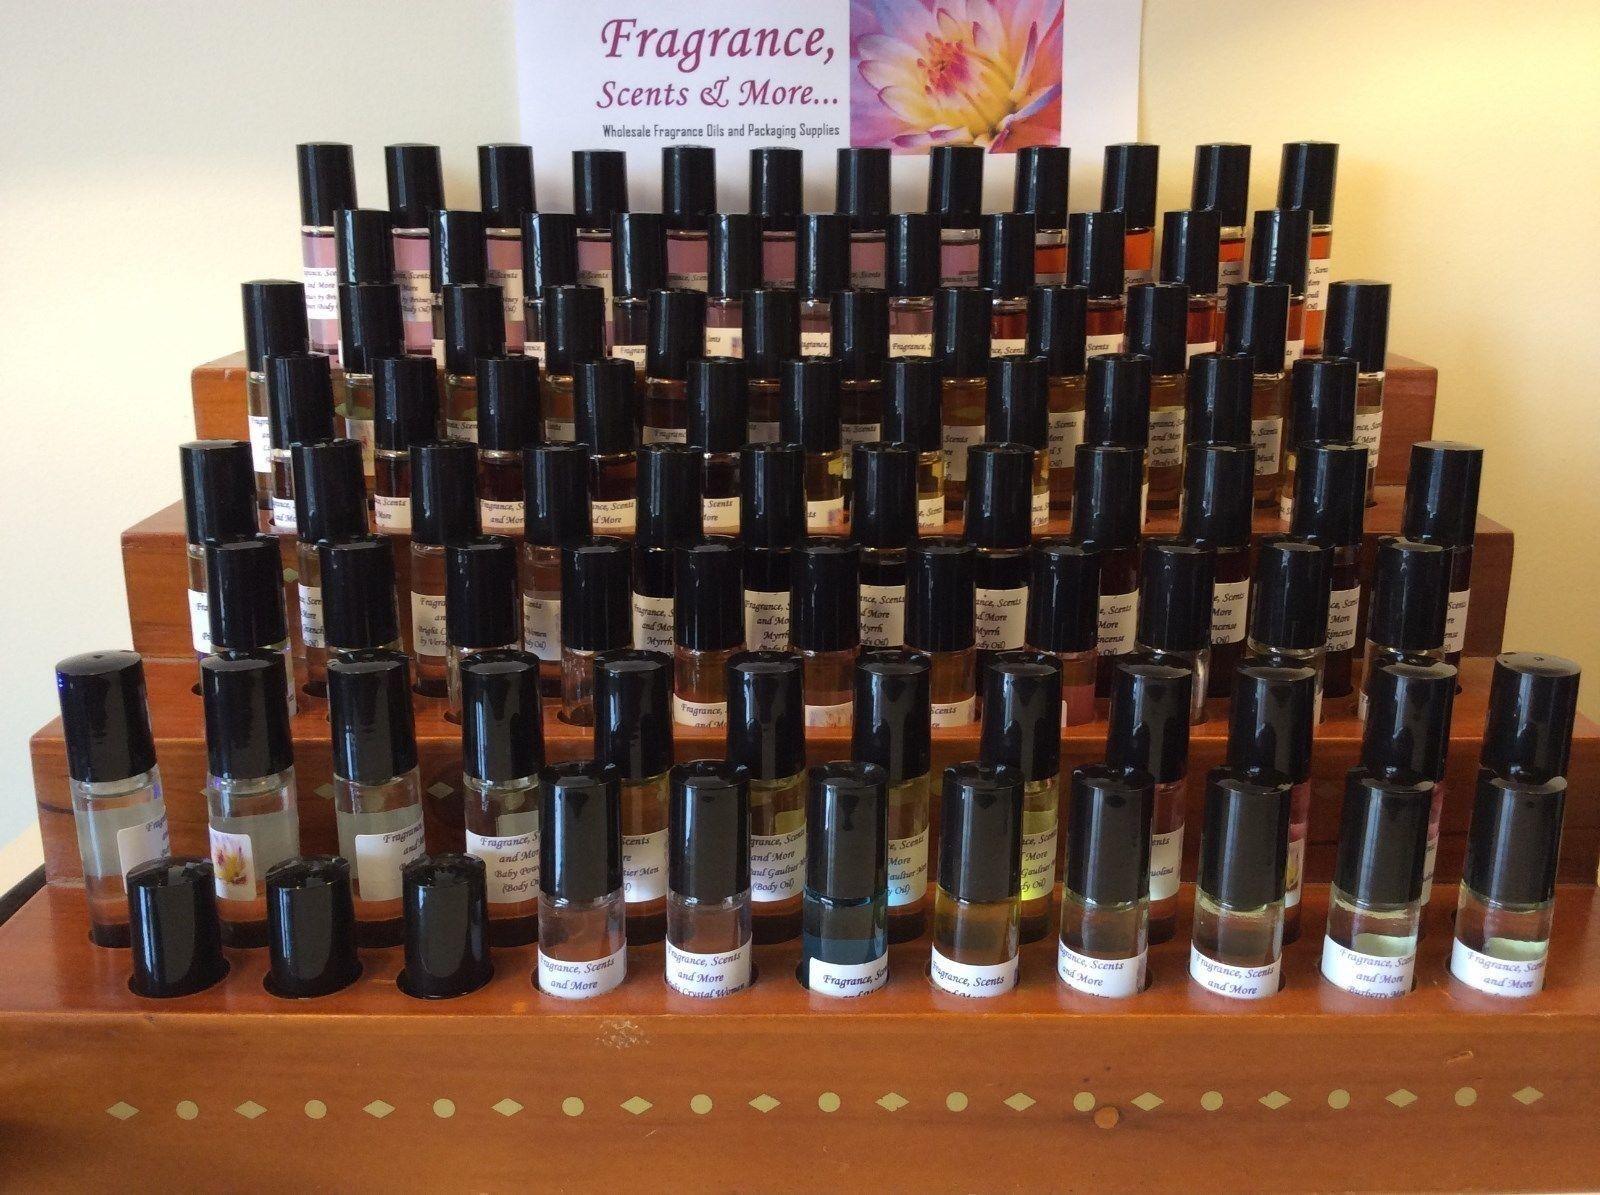 $5.99 - Armani Code Profumo (M) by Giorgio Armani Type Perfume/Body Oil - Free Shipping